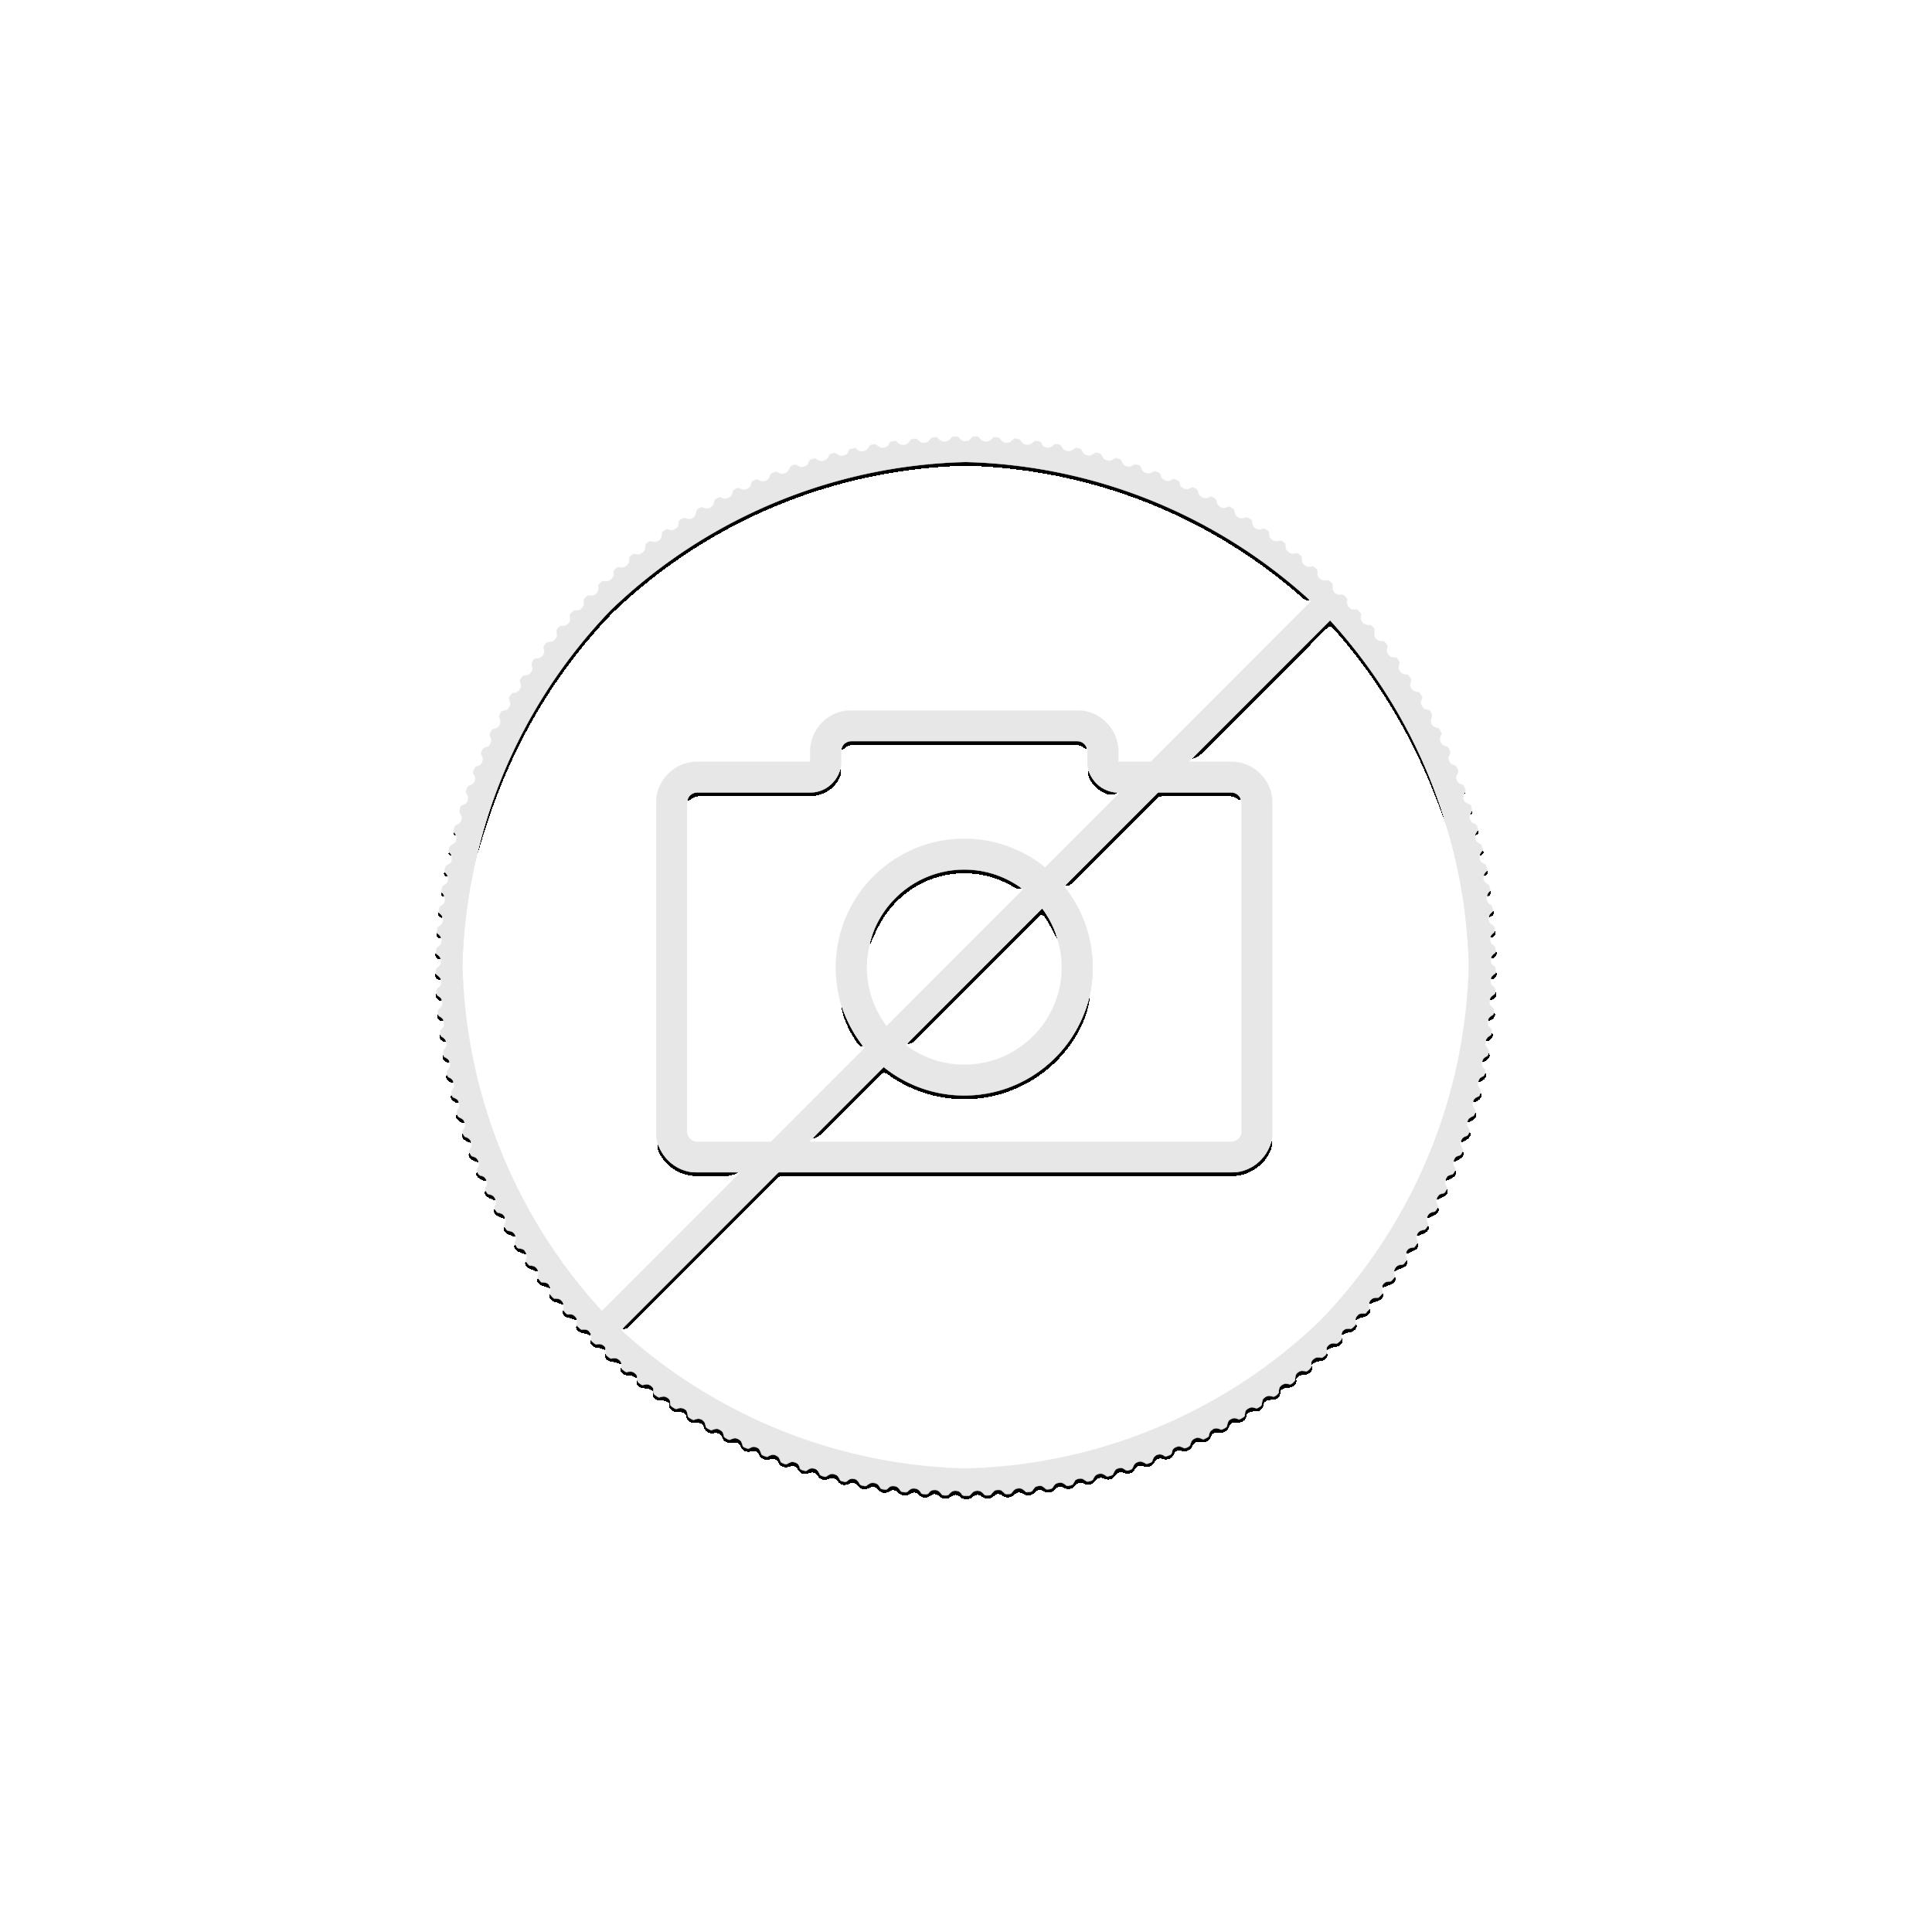 Gouden 1/4 troy ounce Lunar munt 2012